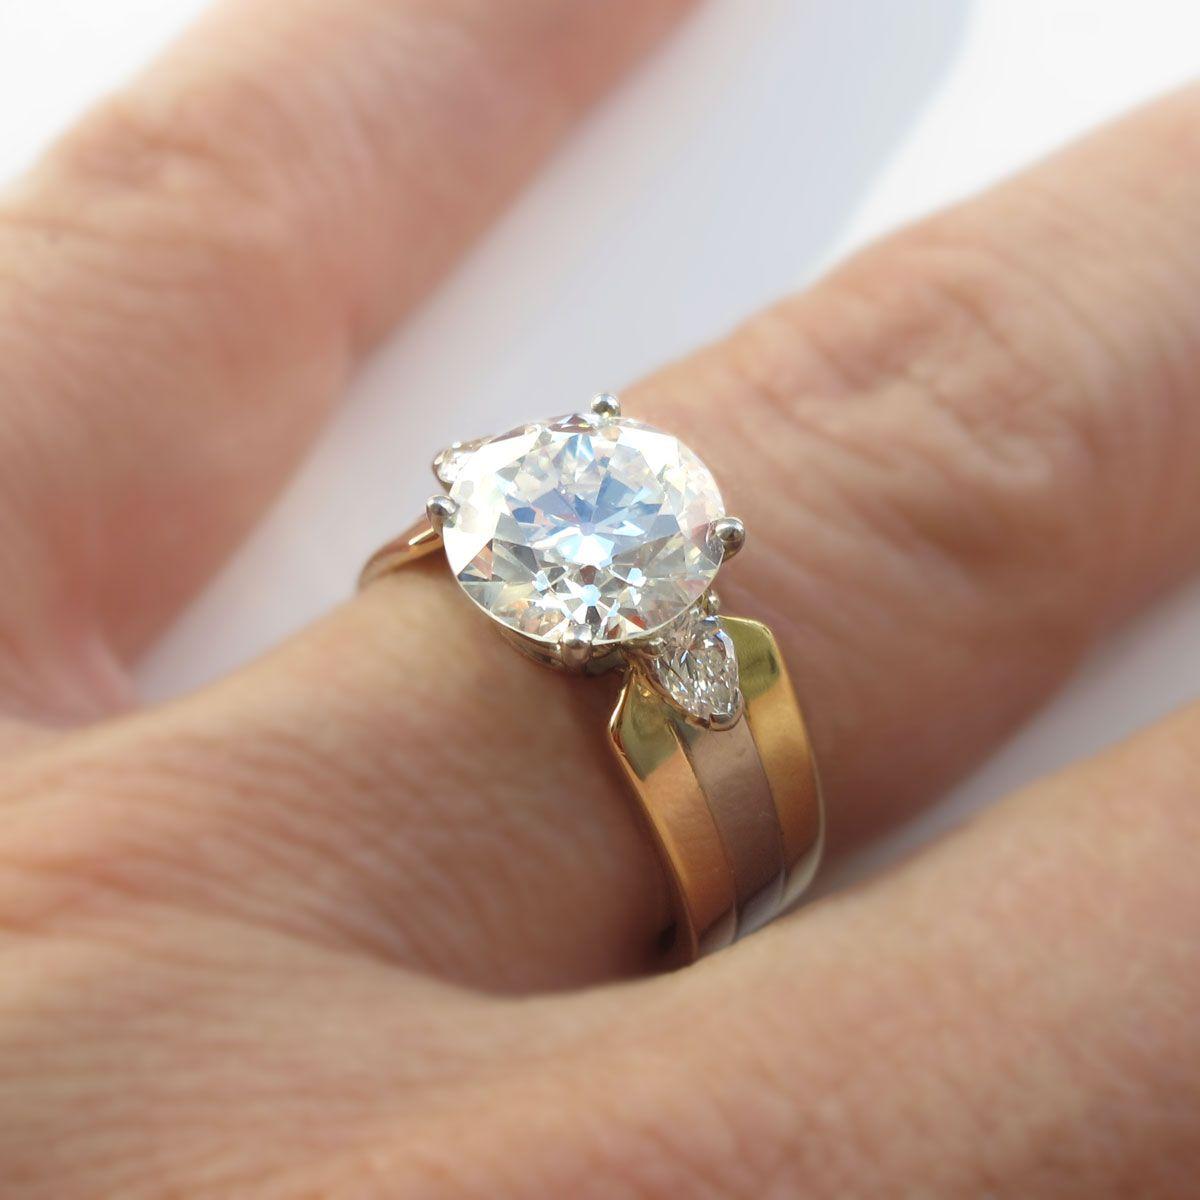 wedding ring prices Cartier 3 32 European Cut Diamond Engagement Ring